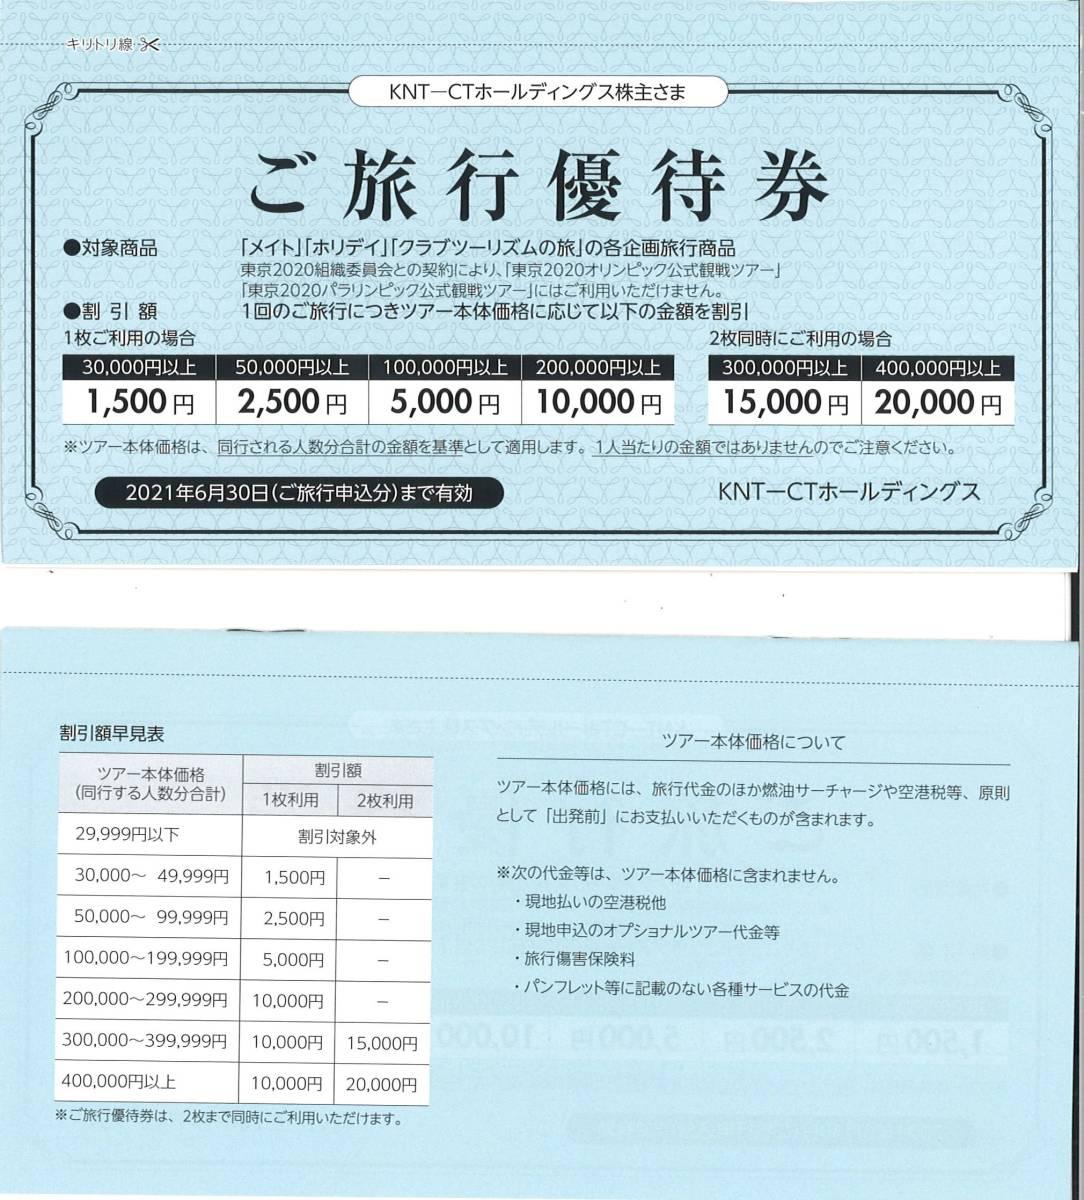 KNT-CTホールディングス株主優待券 ご旅行優待券1冊(2枚綴) 有効期限:2021.6.30 クラブツーリズム/KNTCT/メイト/近畿日本ツーリスト/割引券_画像1